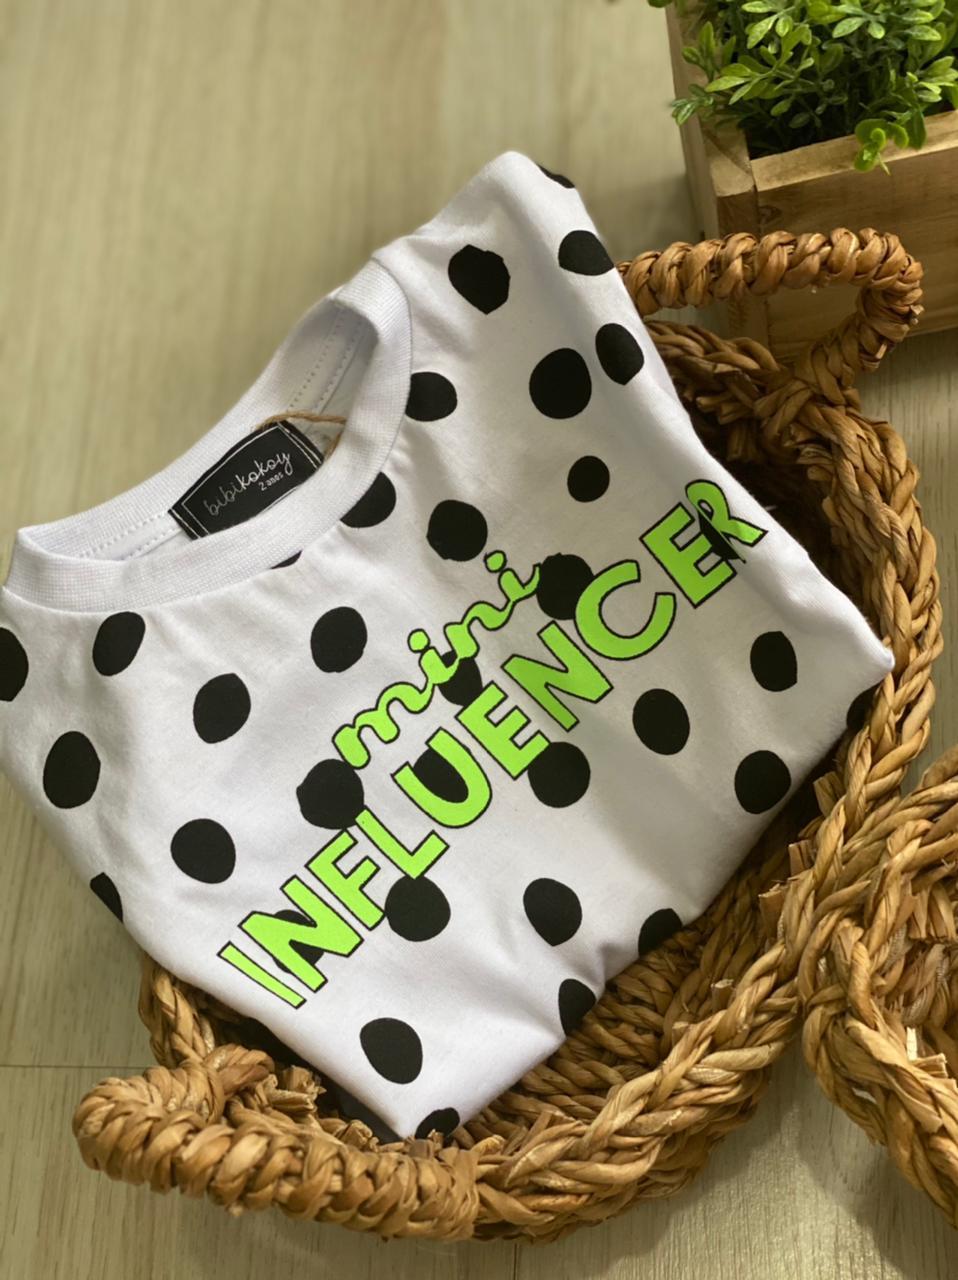 T-shirt Mini Influencer - PIJAMAS UPA CAVALINHO